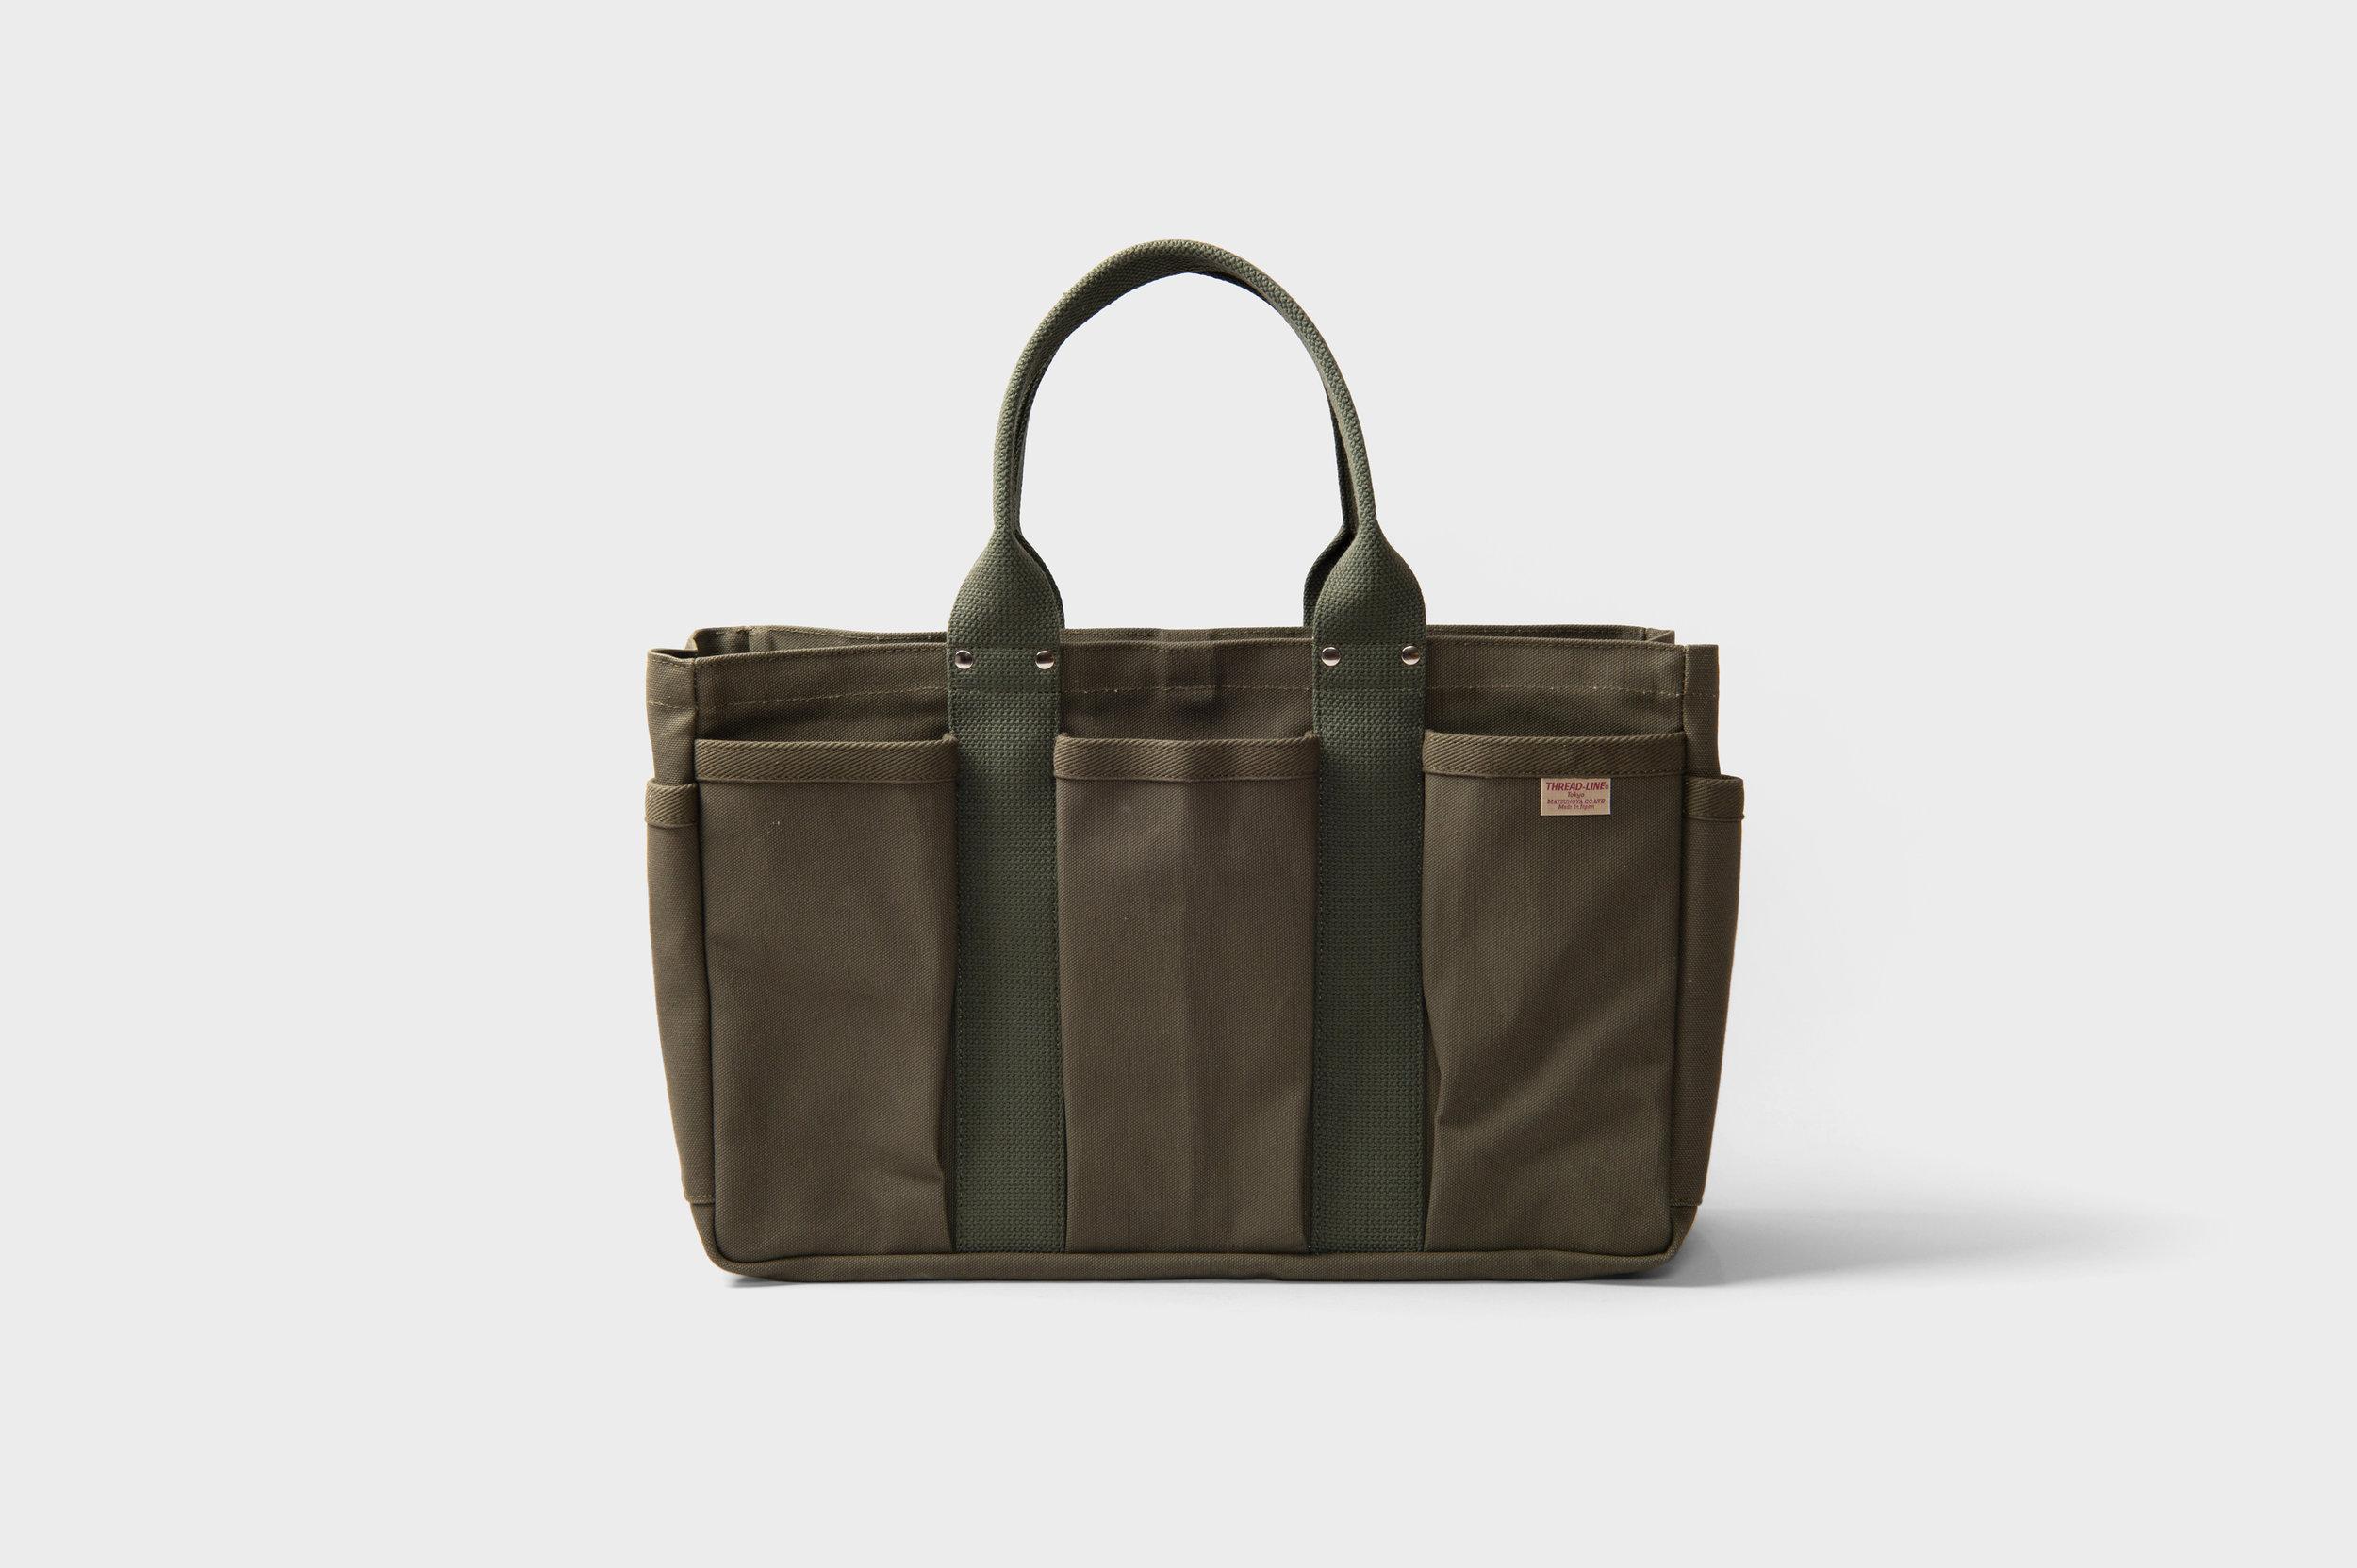 Native&Co-Heavy-Canvas-Tool-Bag-Green-L.jpg